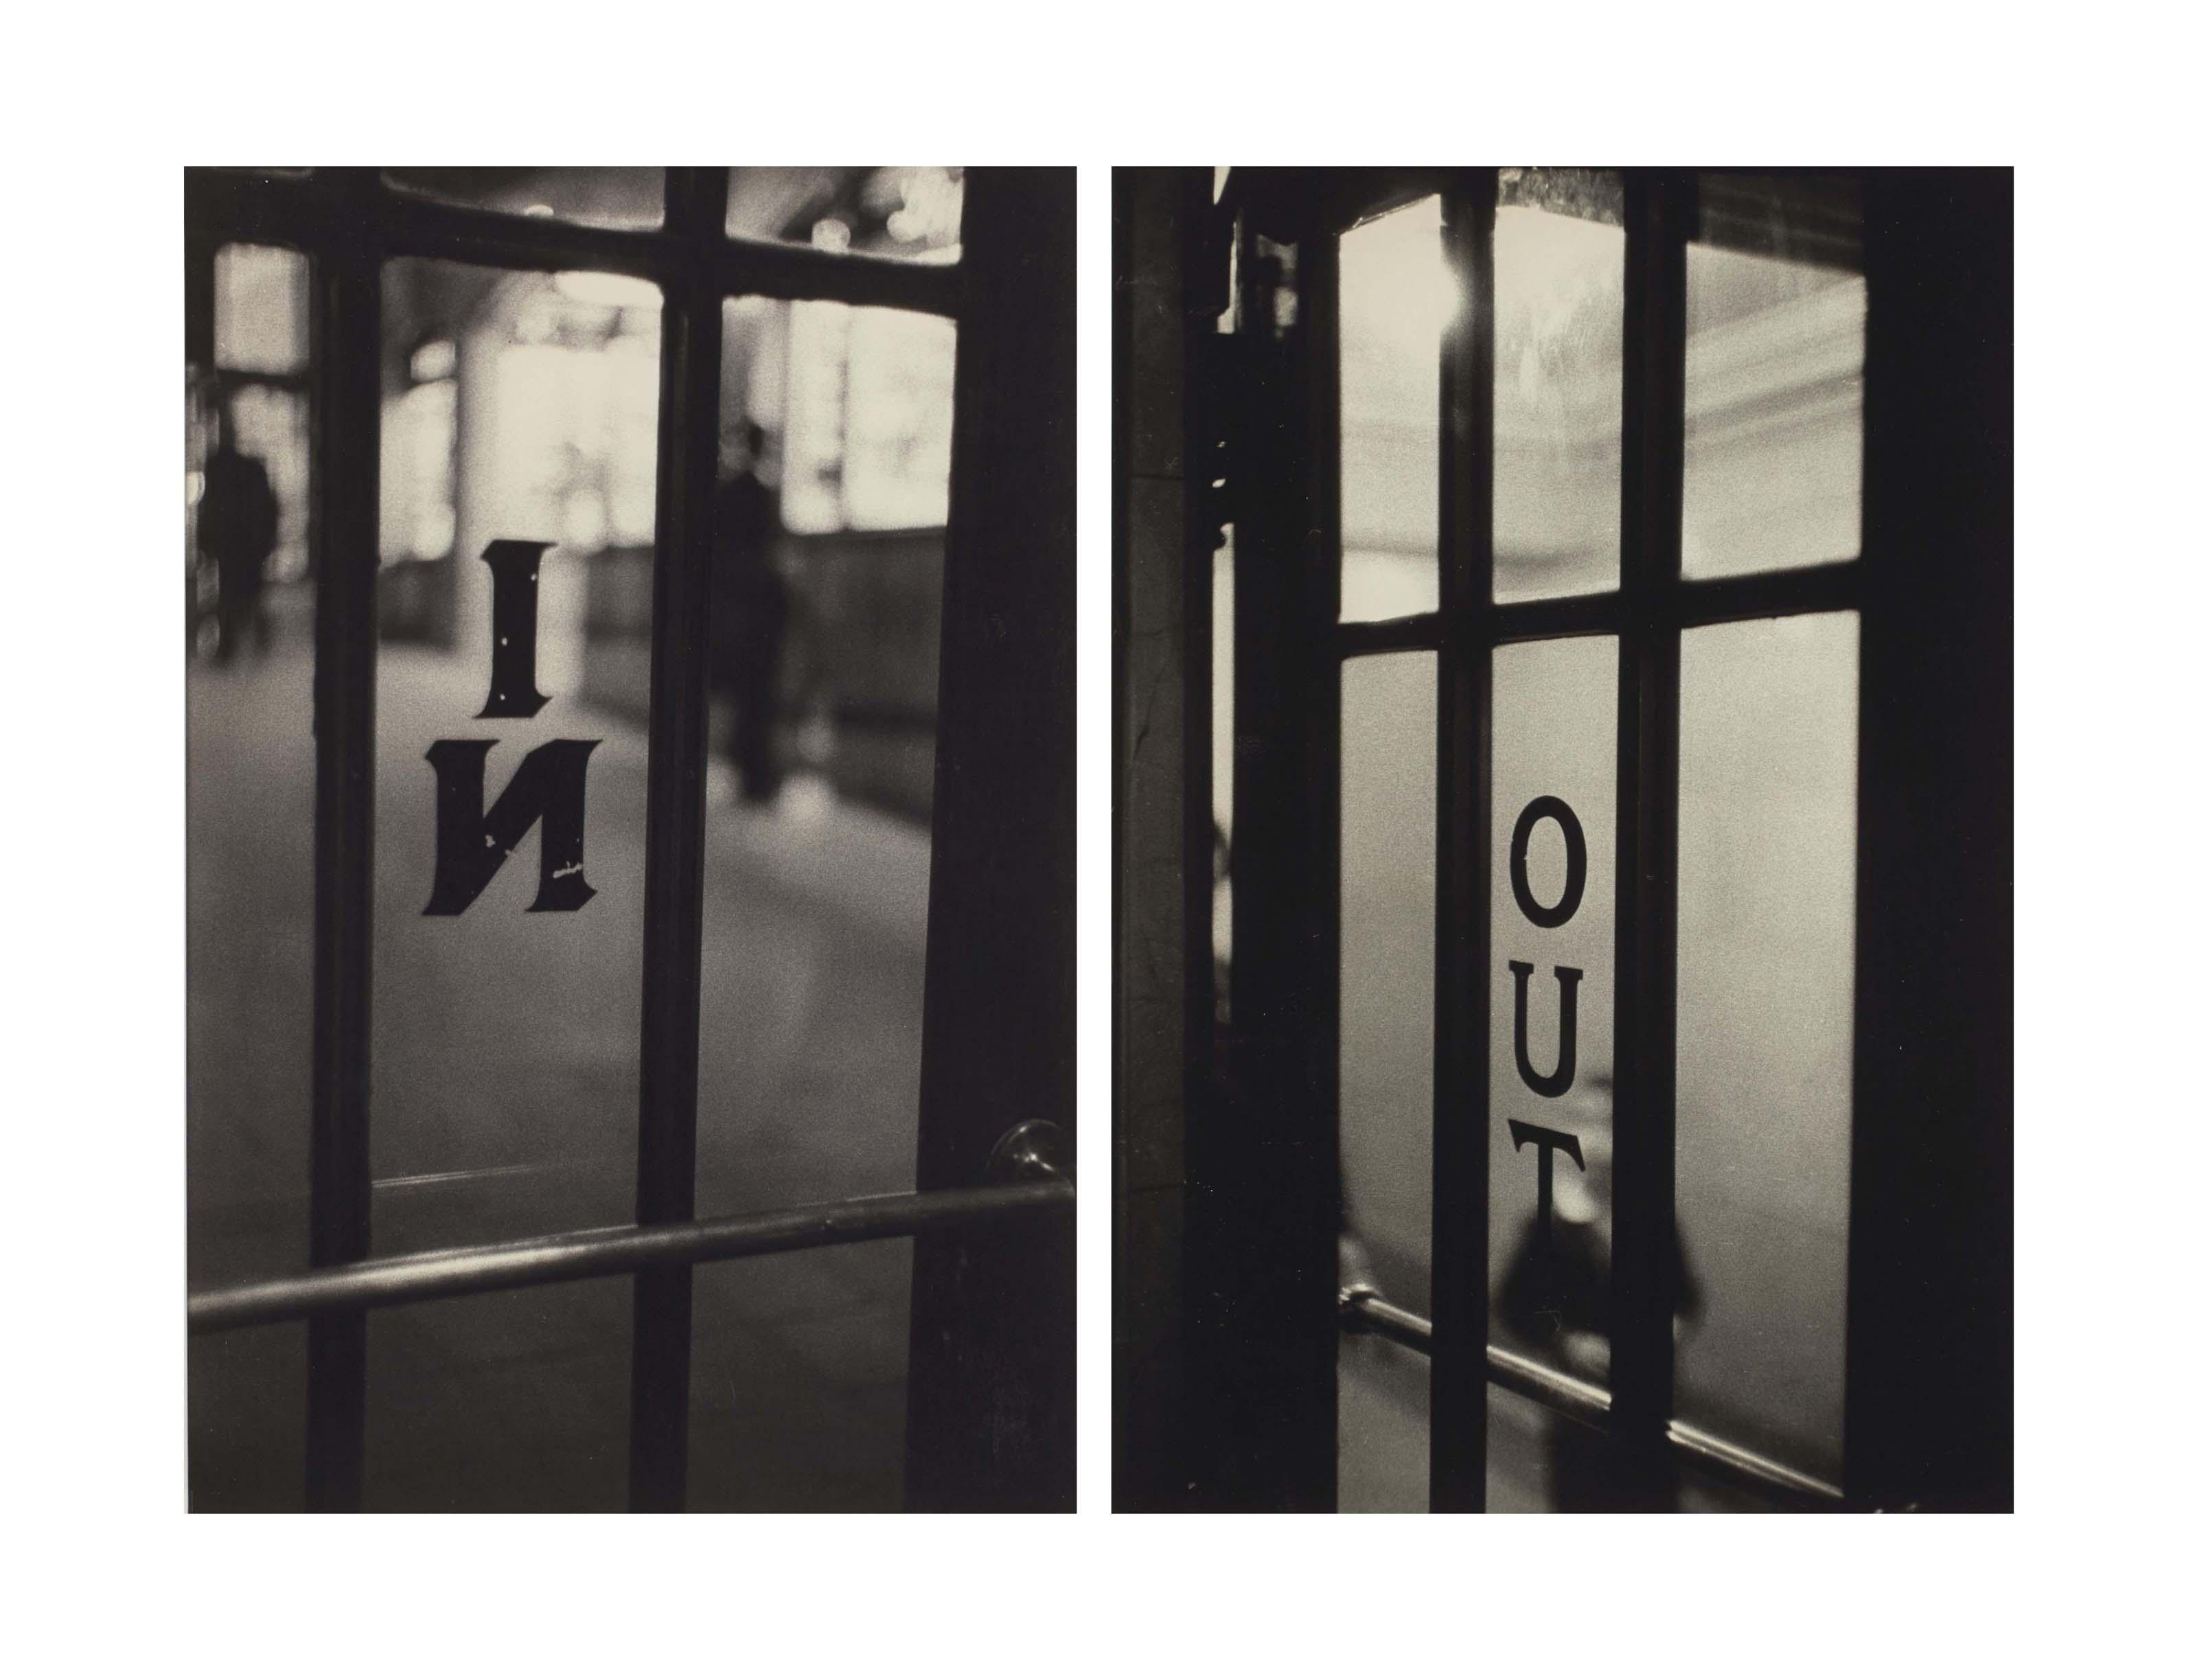 Penn Station, vers 1958